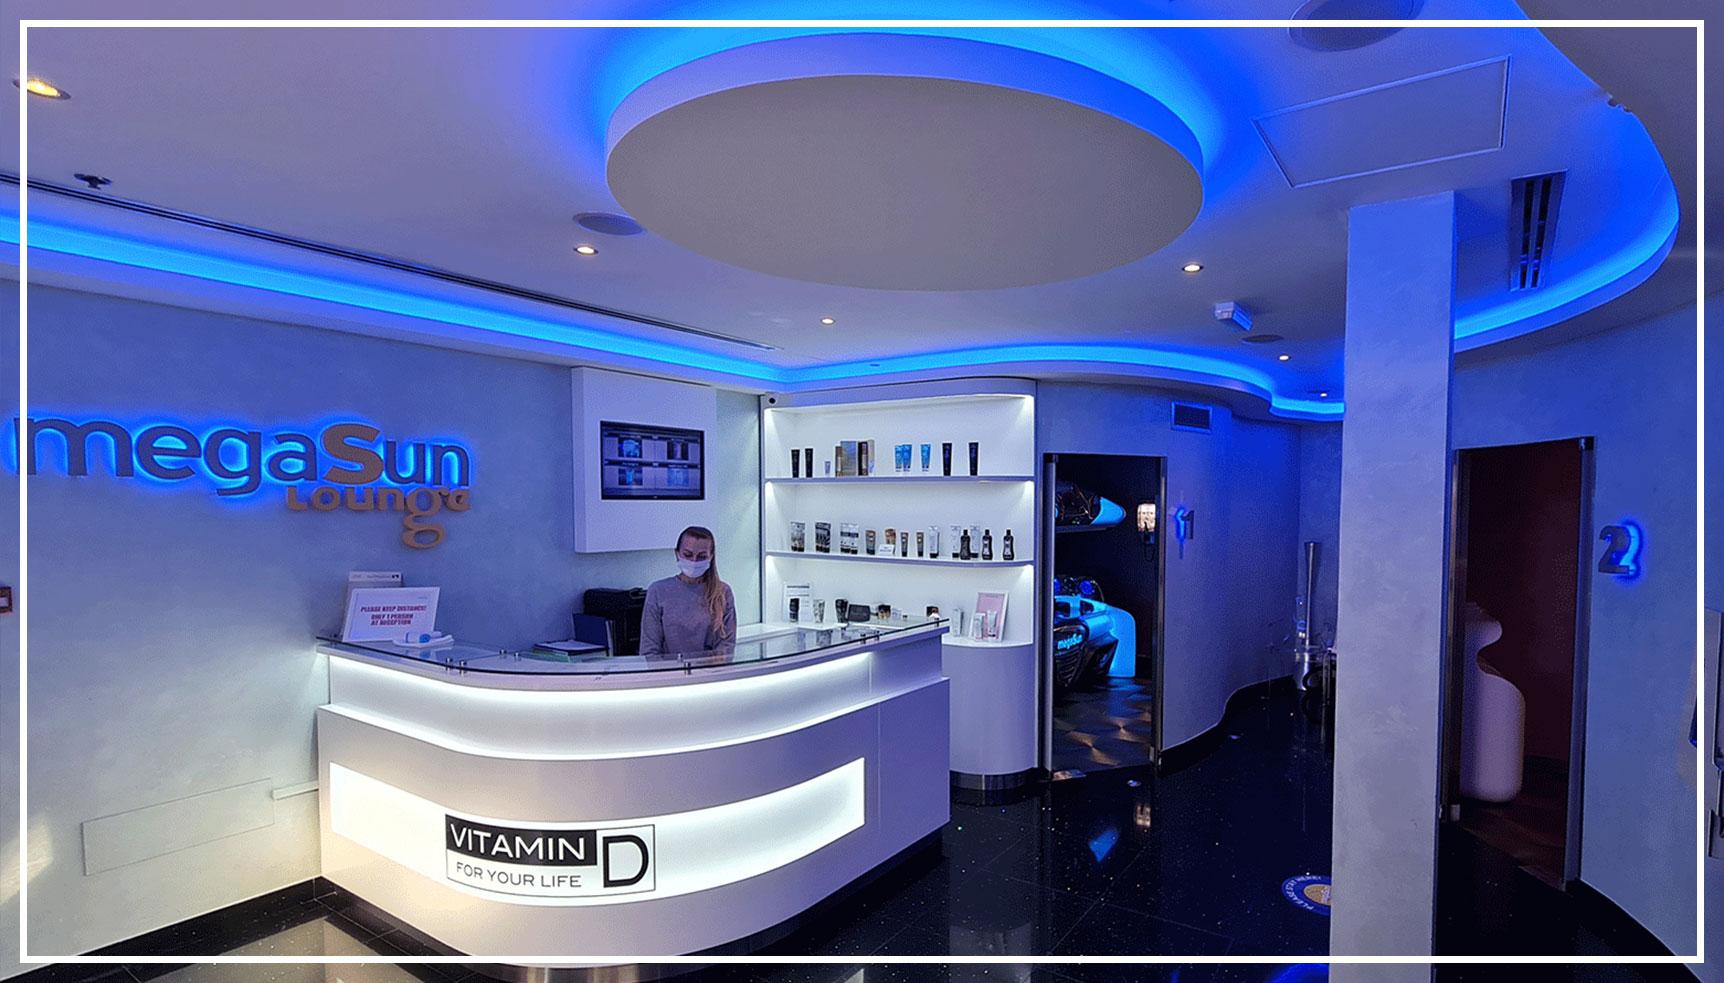 Megasun lounge reception